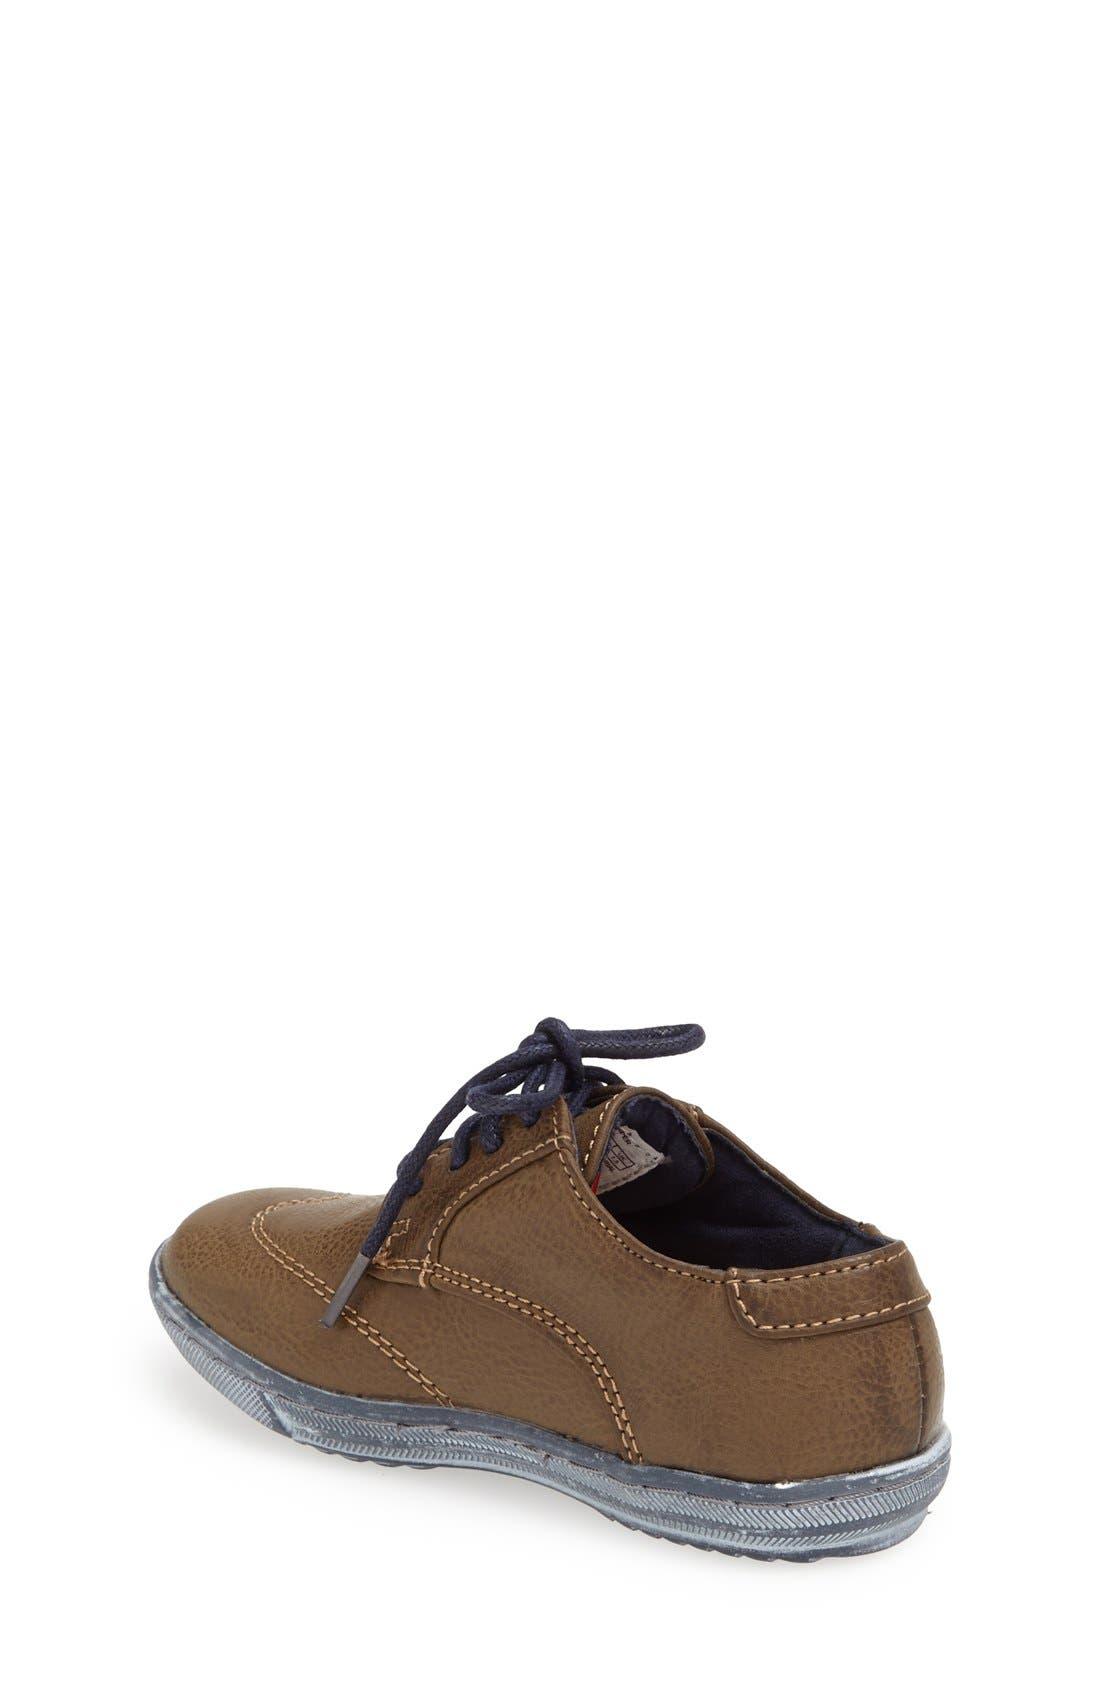 Alternate Image 2  - Cole Haan 'Anthony Jasper' Sneaker (Toddler)